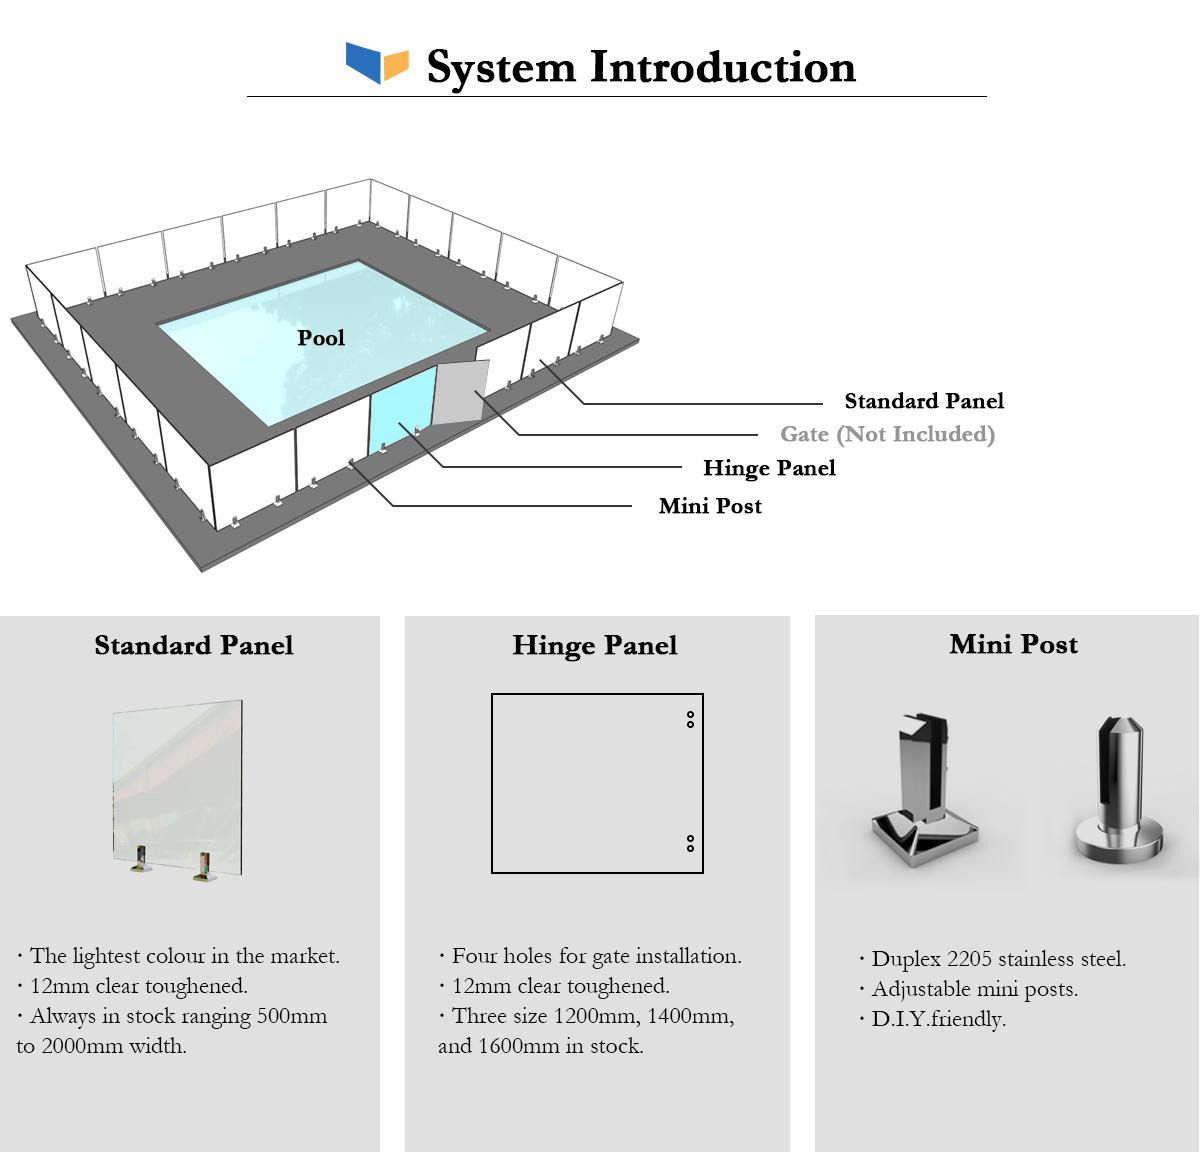 system-intro-revised.jpg